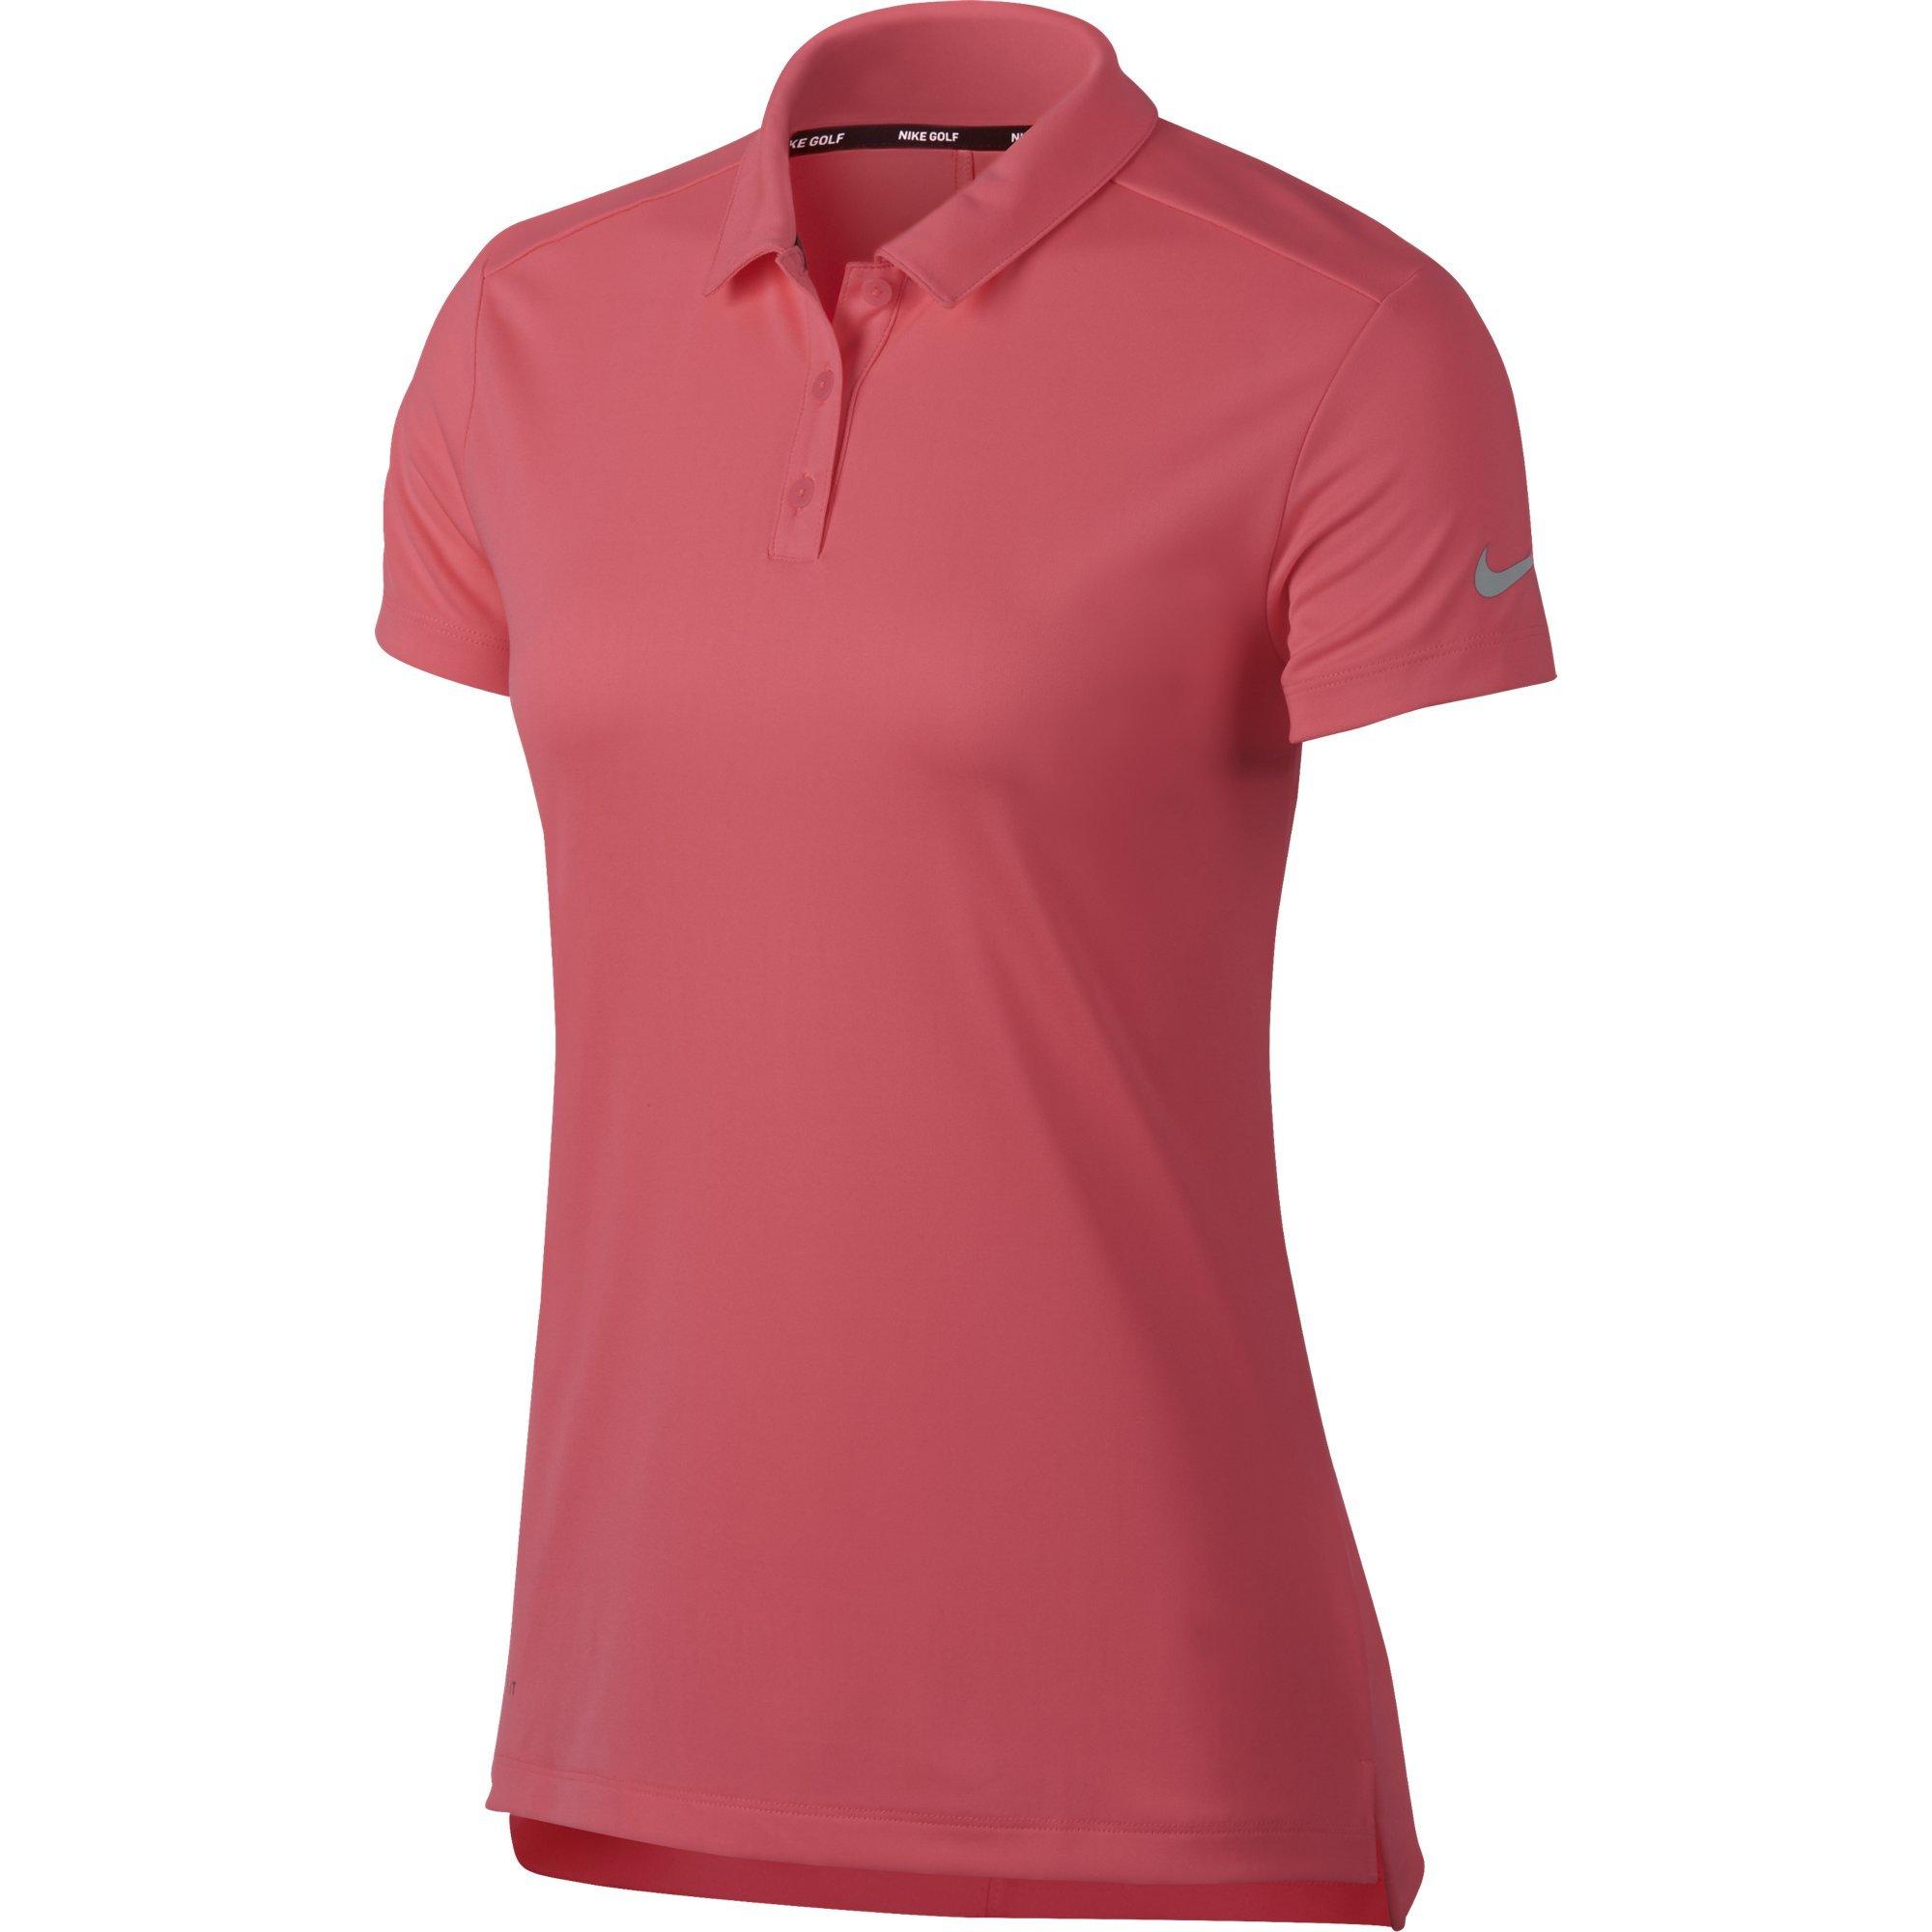 NIKE Women's Dry Short Sleeve Golf Polo, Sunset Pulse/Flat Silver, Medium